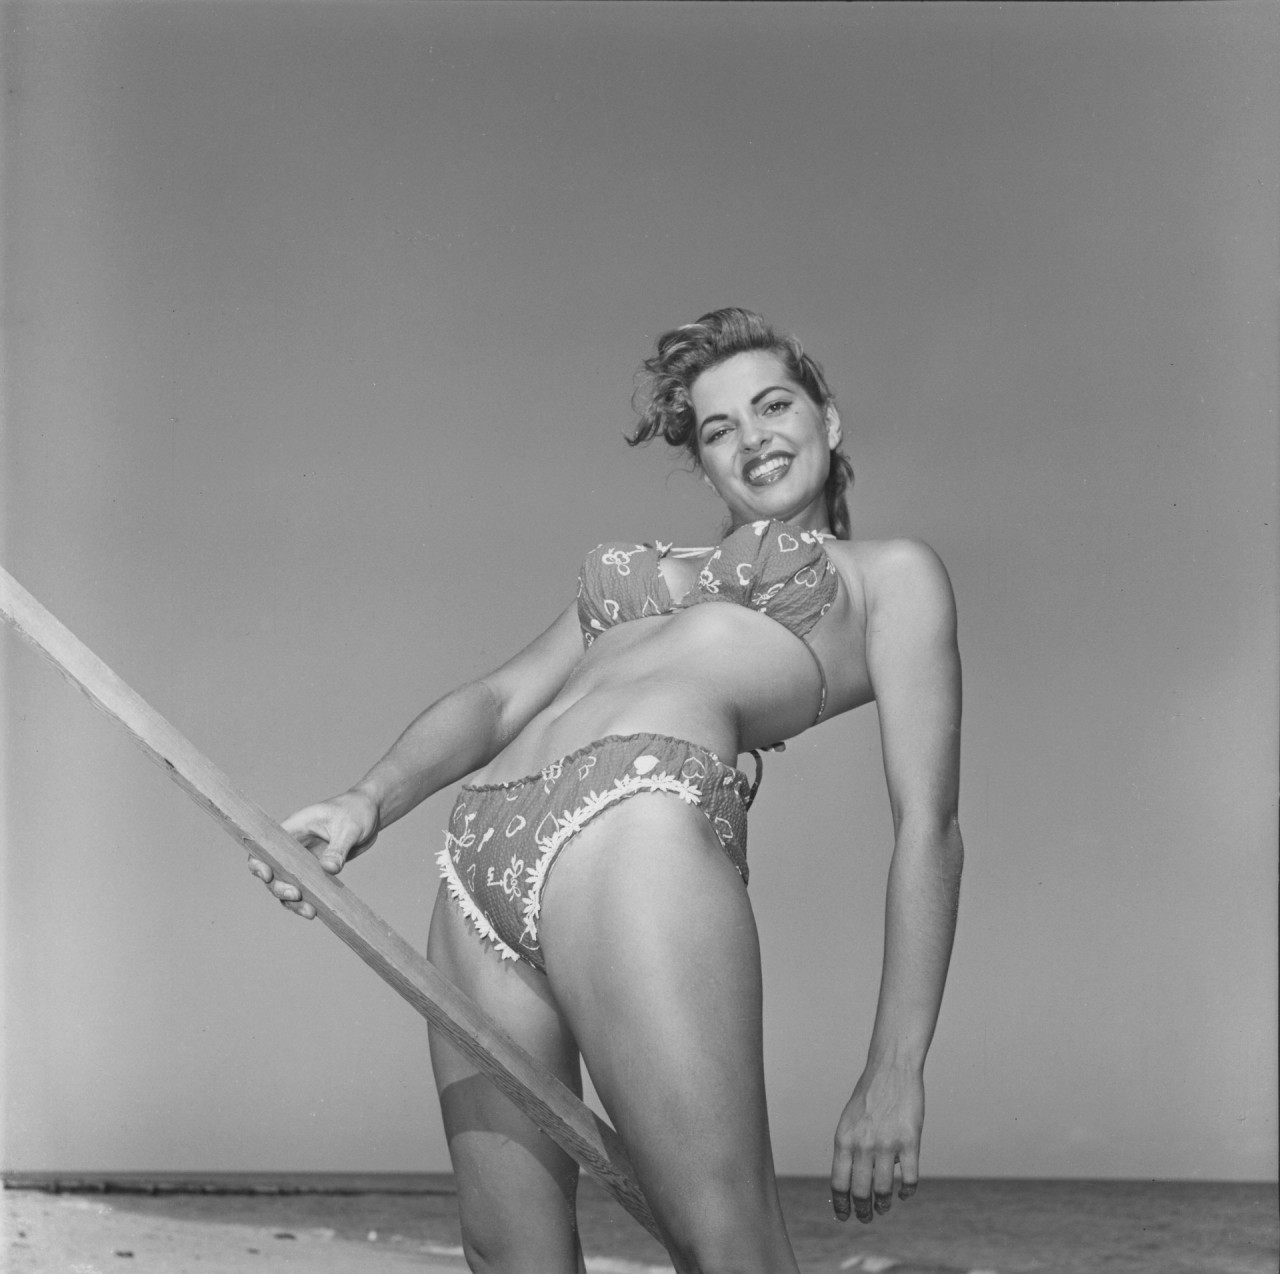 Нэнси Уайт, 1955. Банни Йеджер